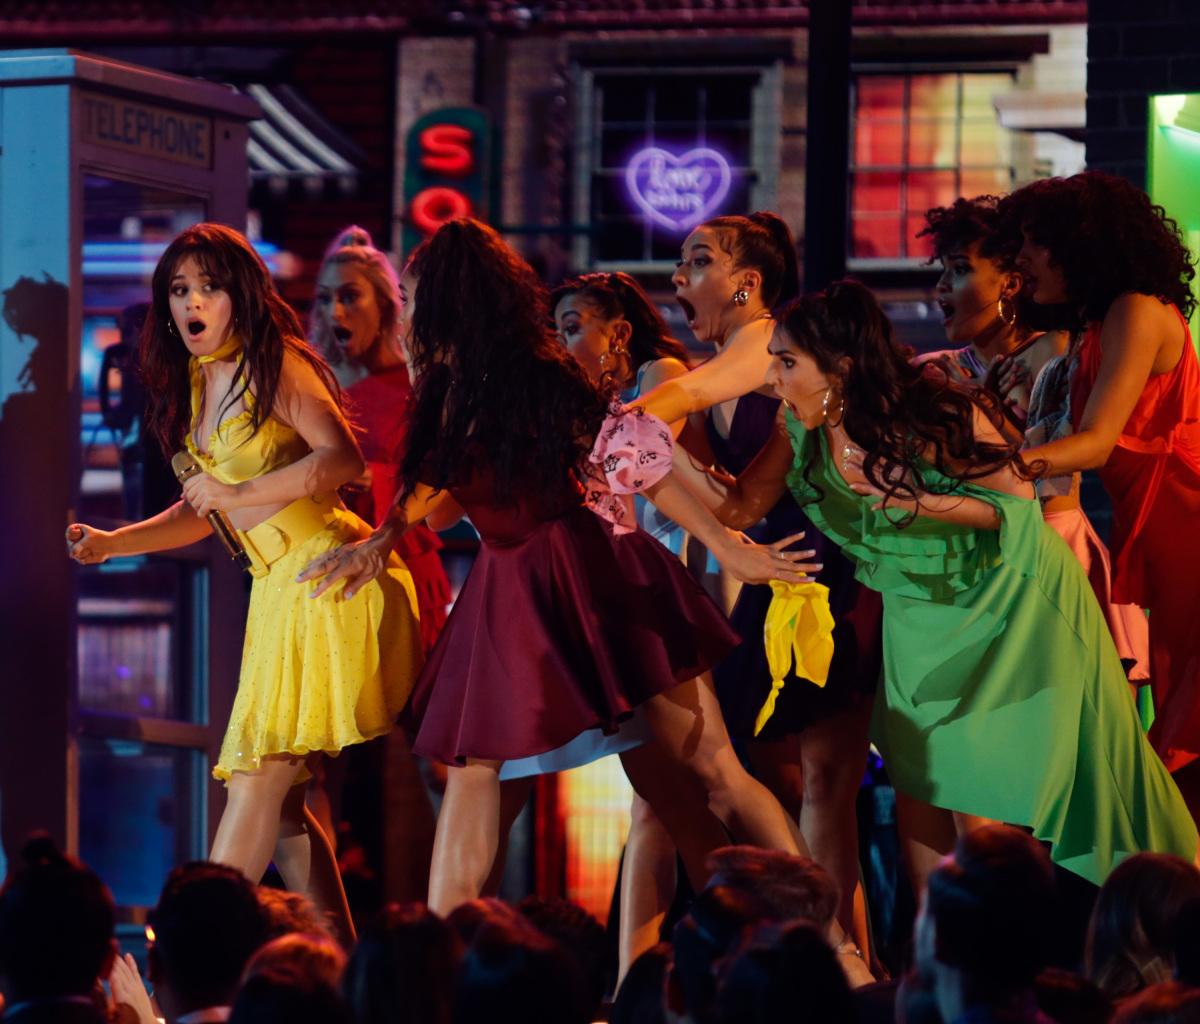 Havana Live Camila Cabello: Camila Cabello Rocked The Grammy Stage With 'Havana